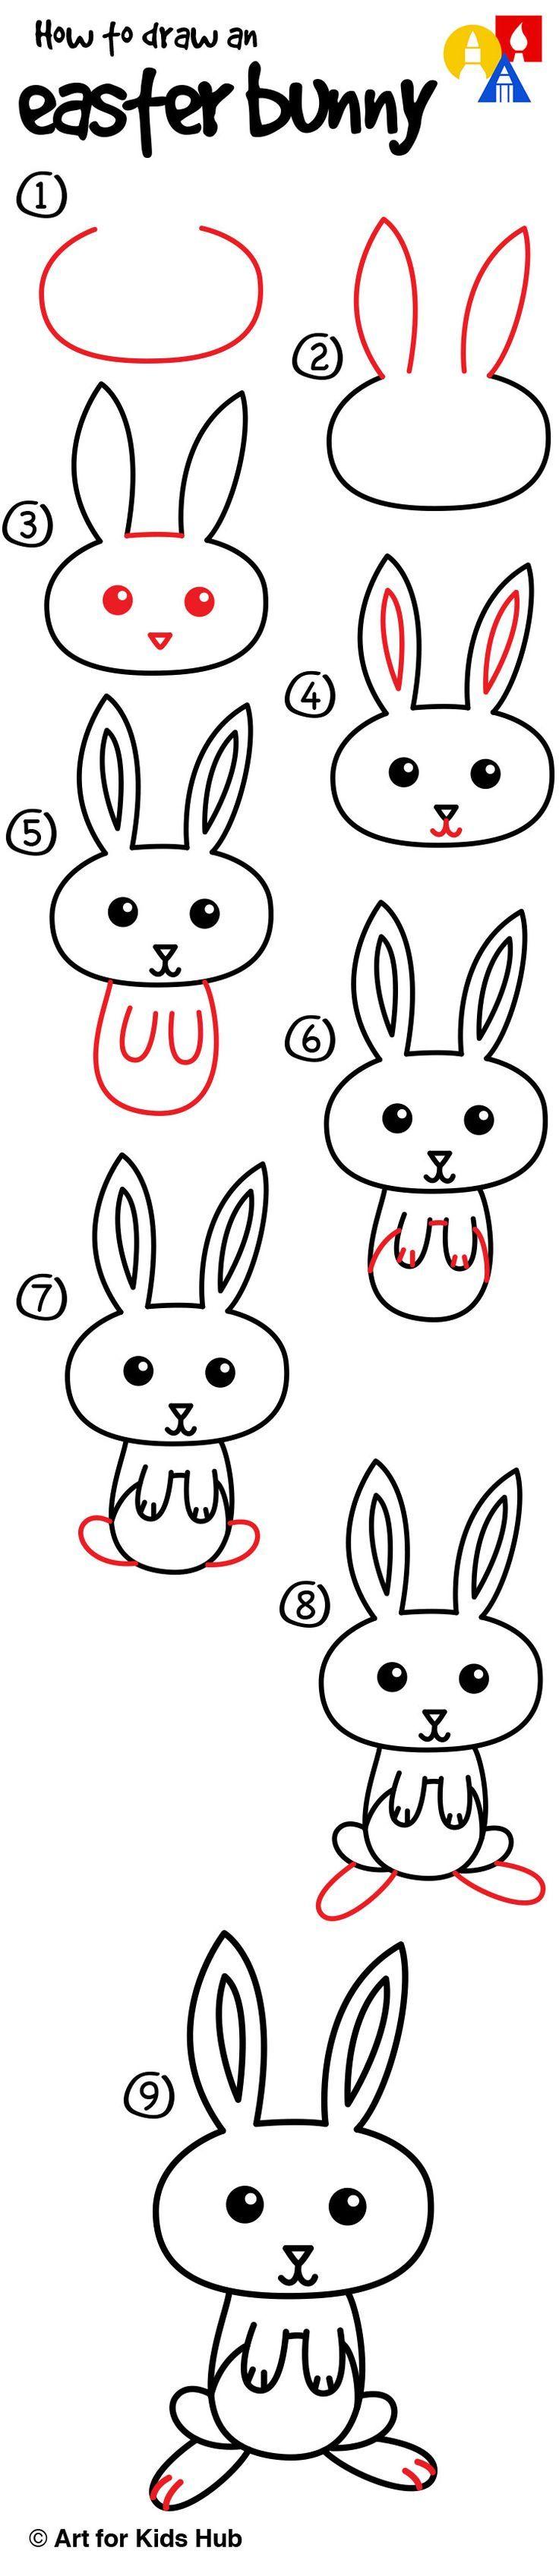 Learn how to draw a cartoon Eater bunny!